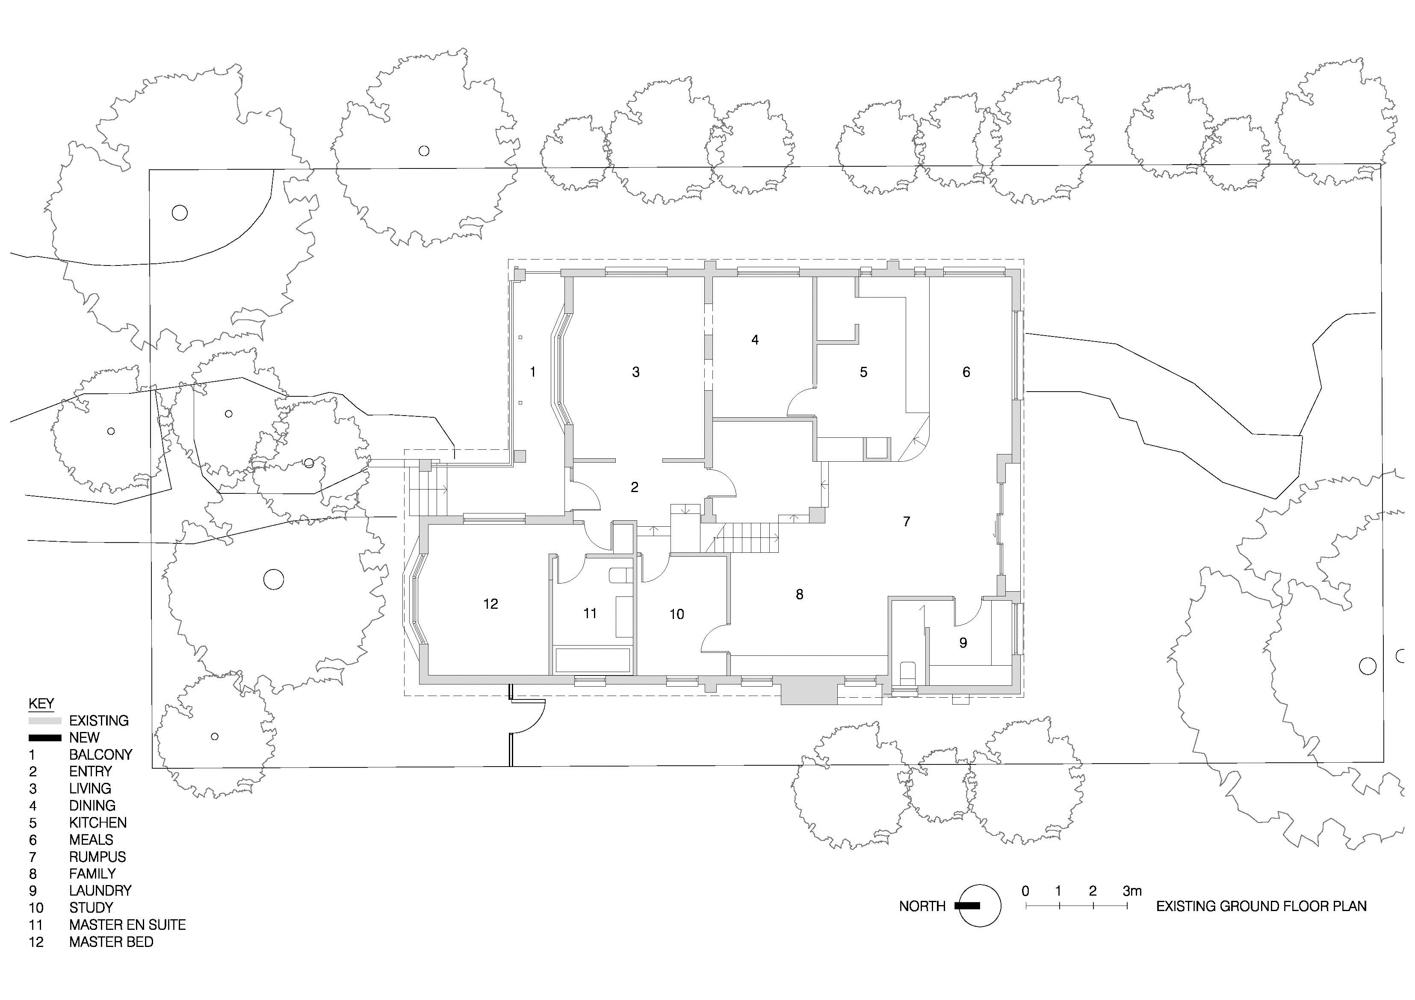 ruffey-lake-house-inbetween-architecture-the-design-emotive-36.jpg